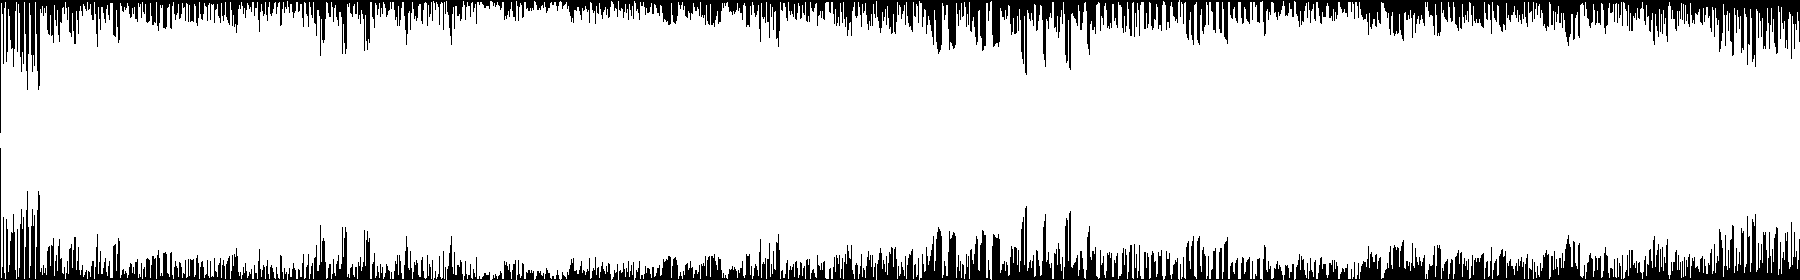 LoFi Chillhop audio waveform